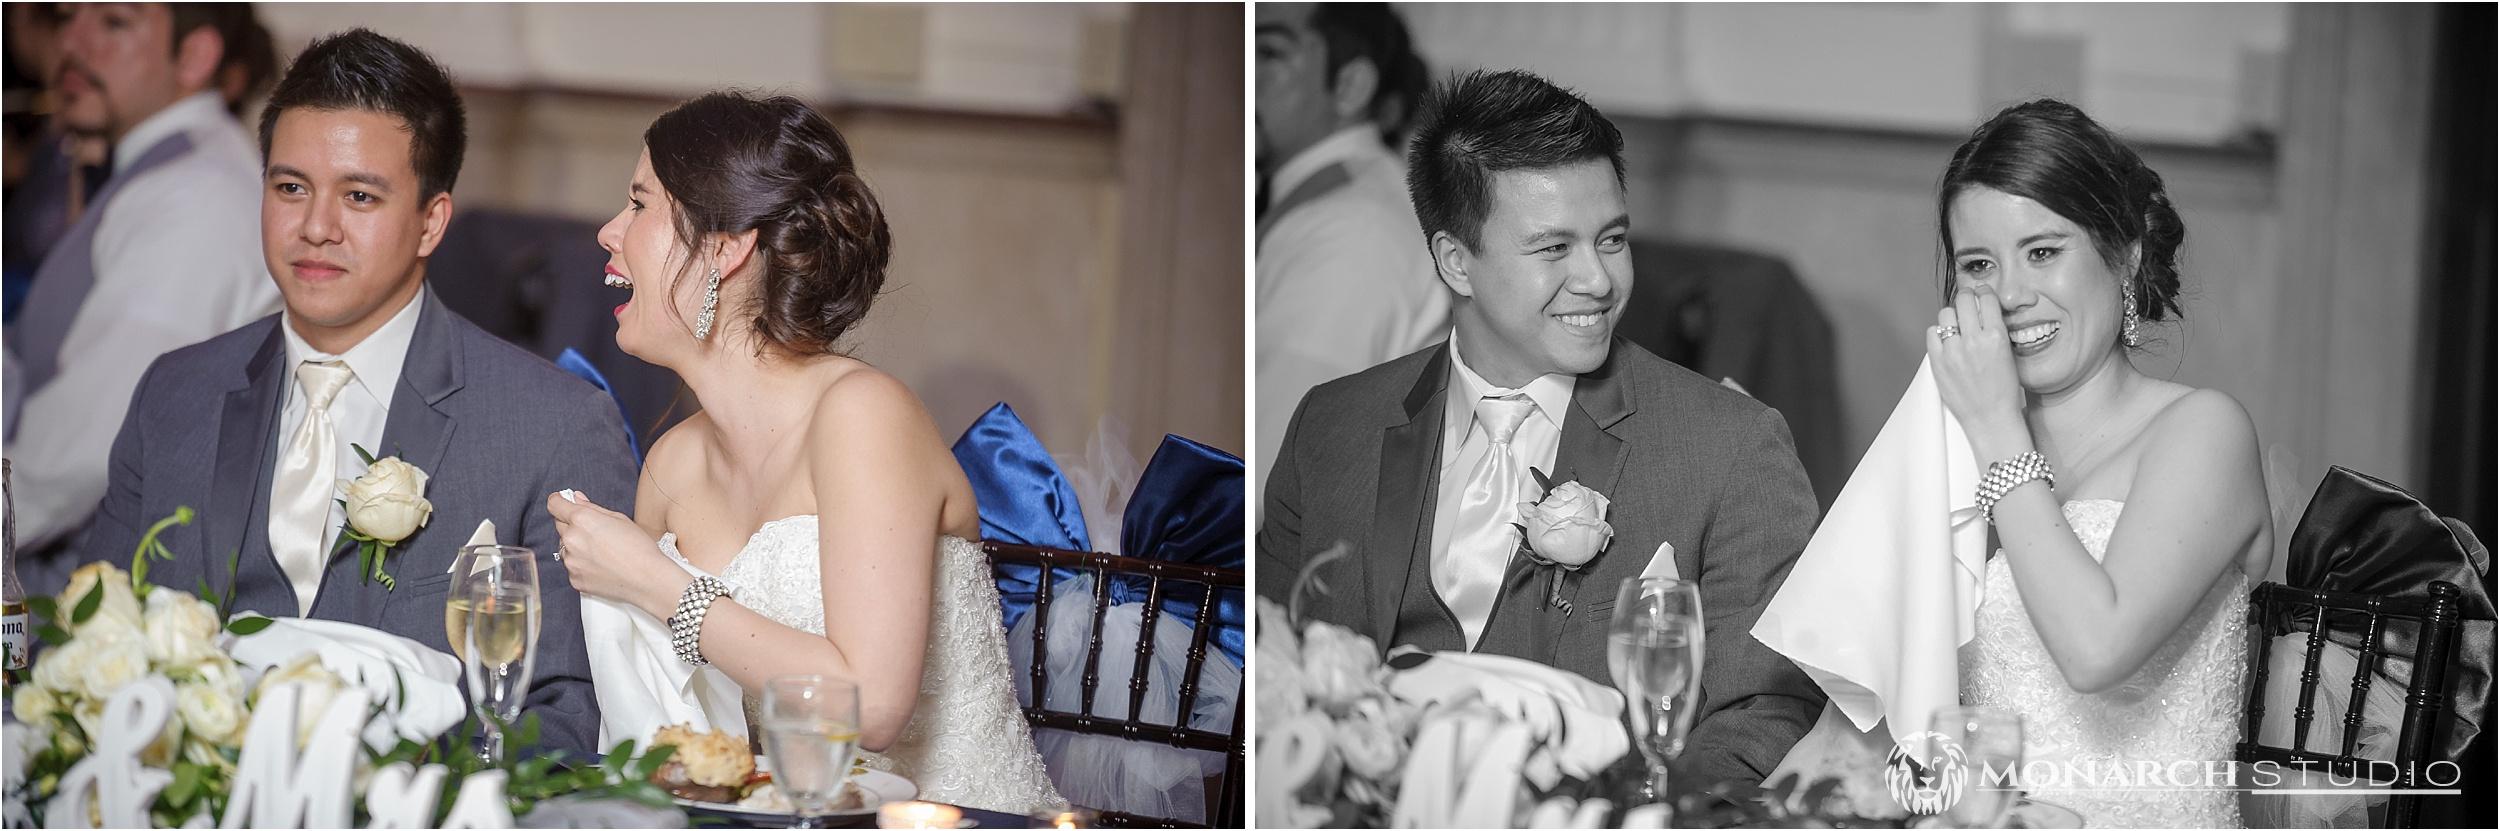 wedding-photographer-in-st-augustine-florida-treasury-092.jpg